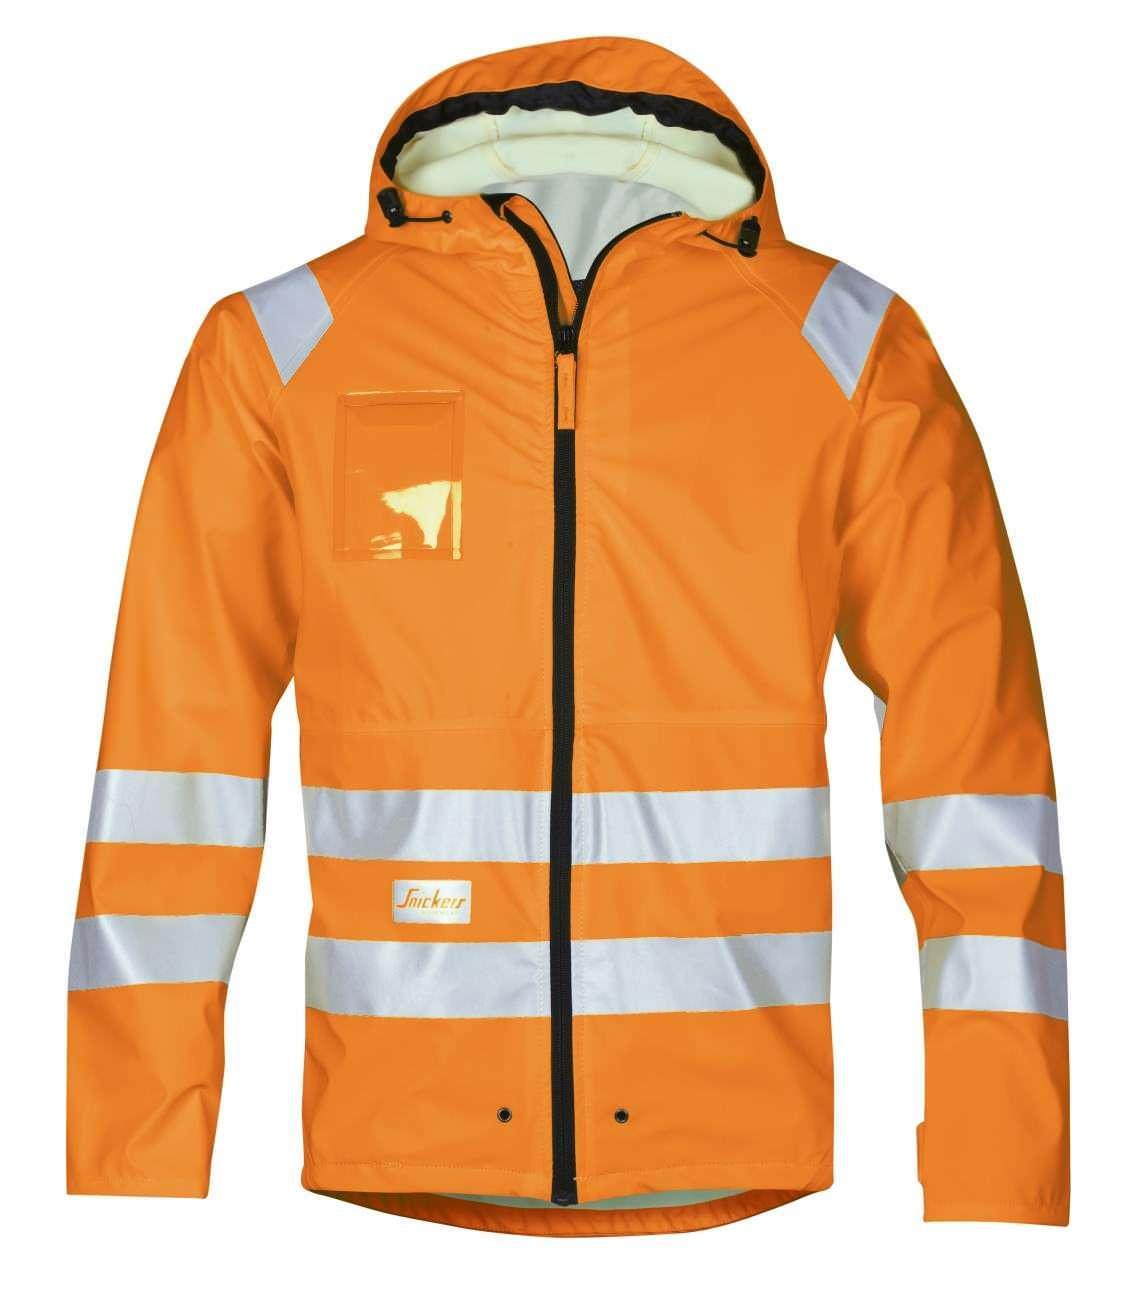 Snickers 8233 High-Vis PU Rain Jacket, Class 3